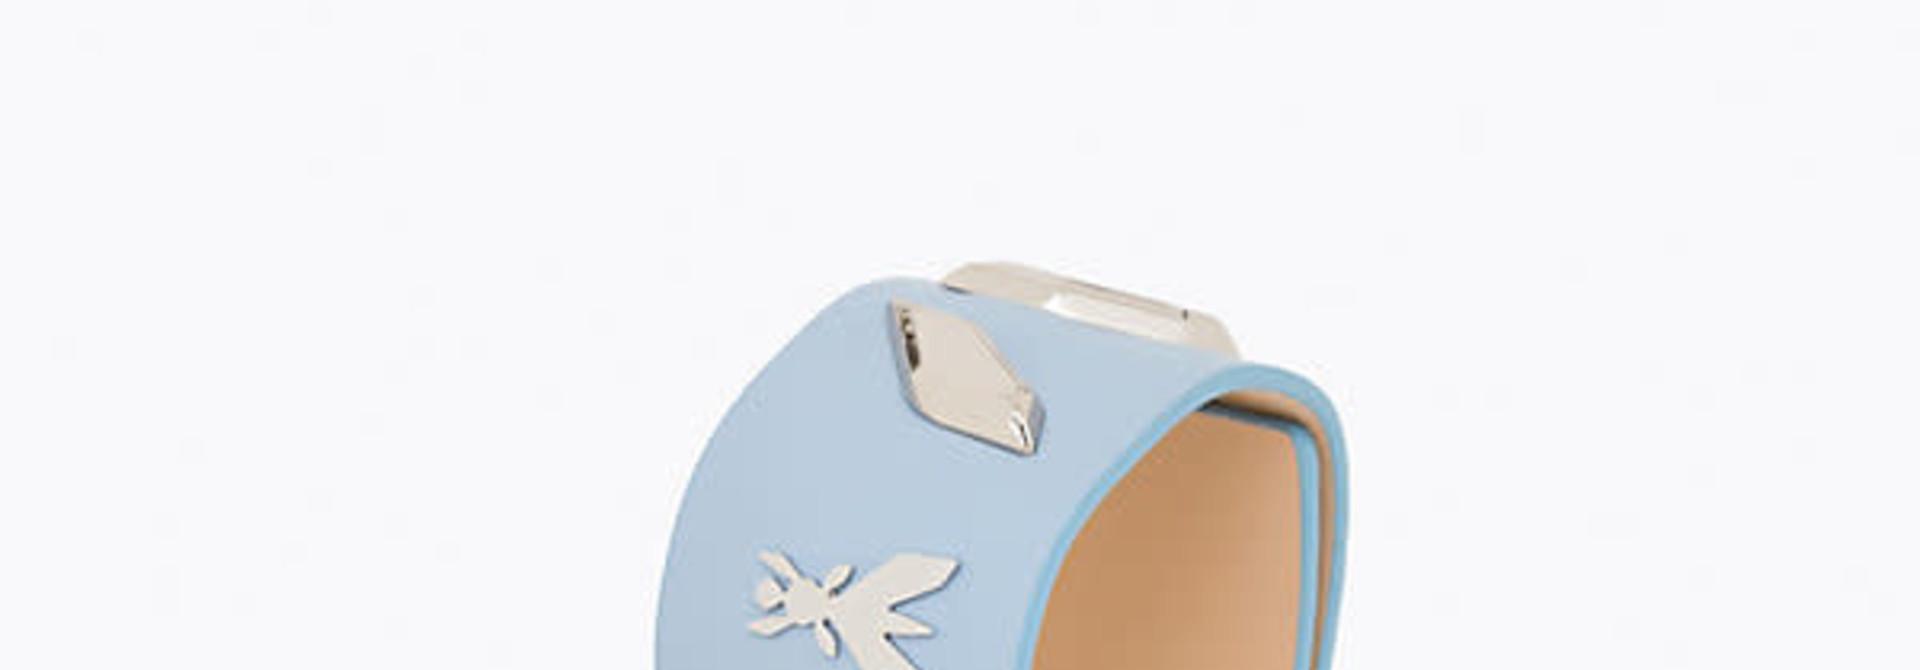 Armband Patrizia Pepe 2V9030 A5H2